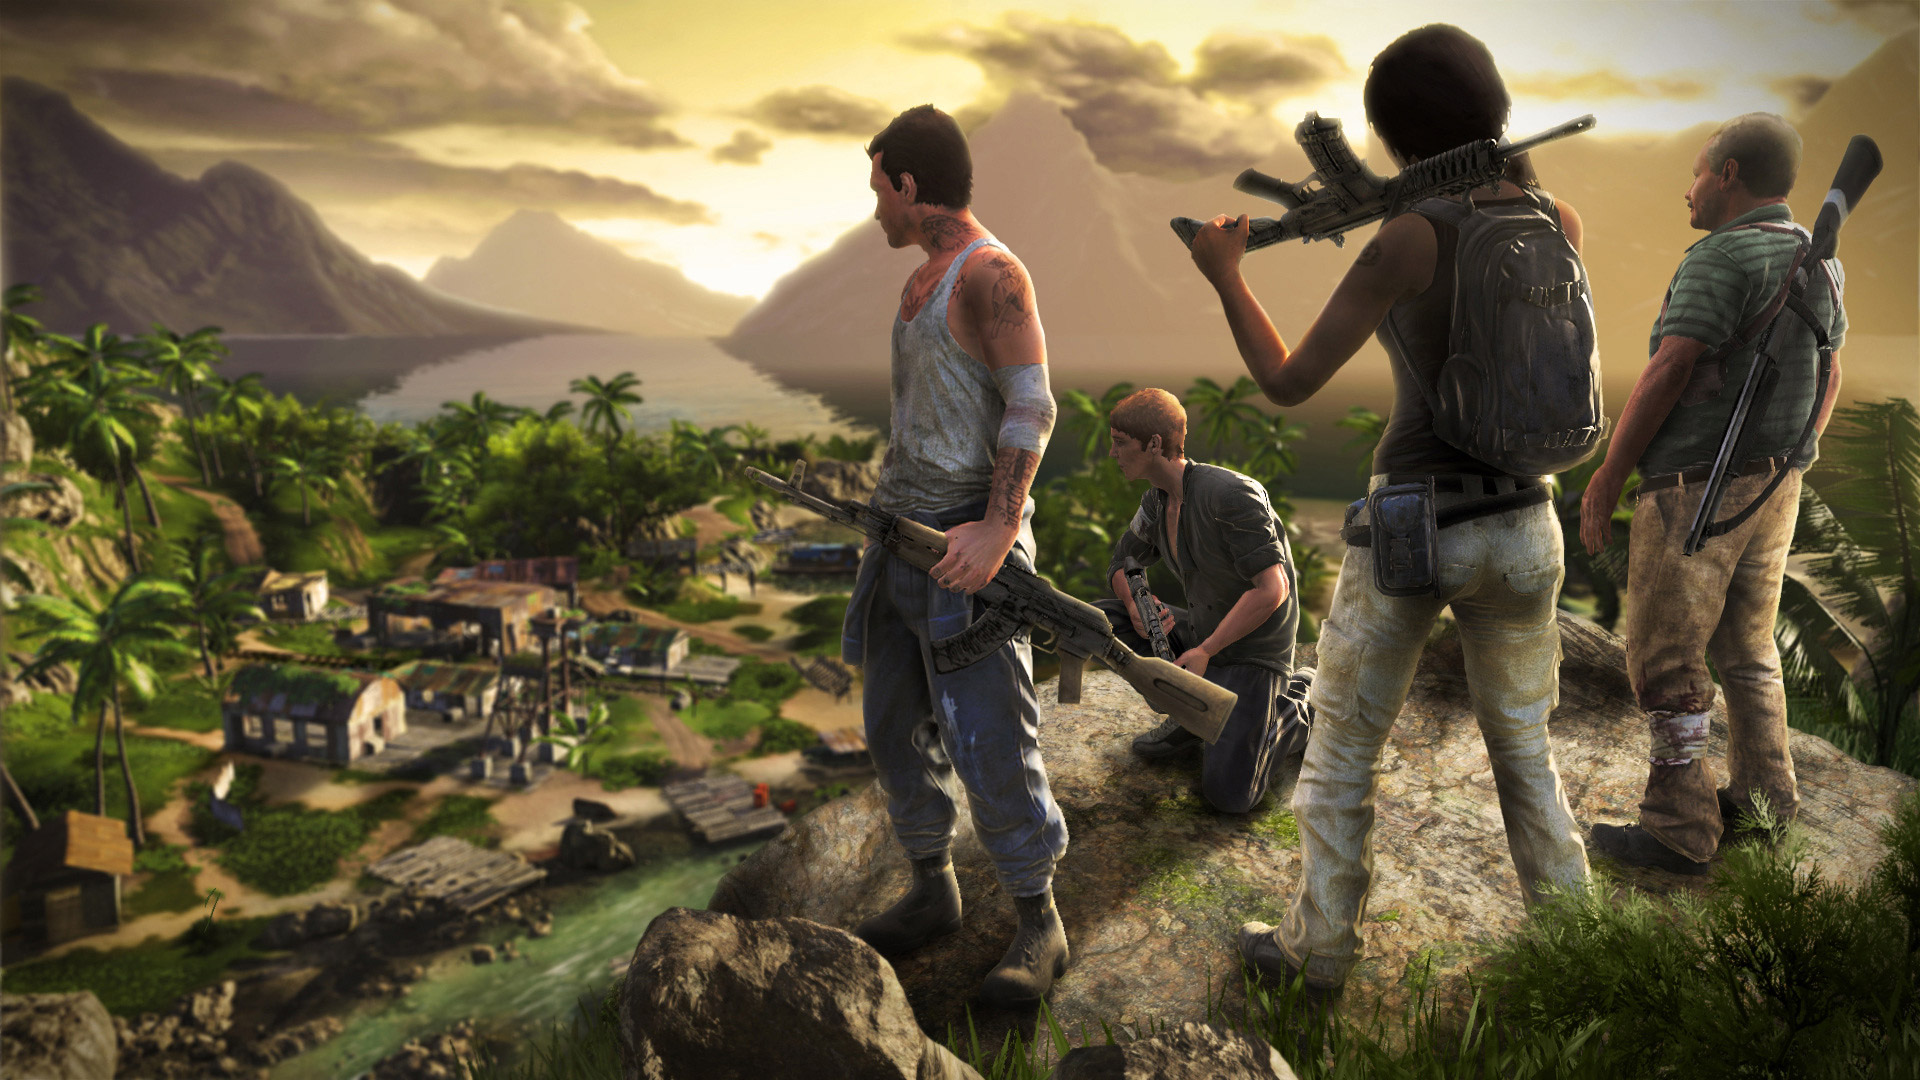 Far Cry 3 Wallpaper in 1920x1080